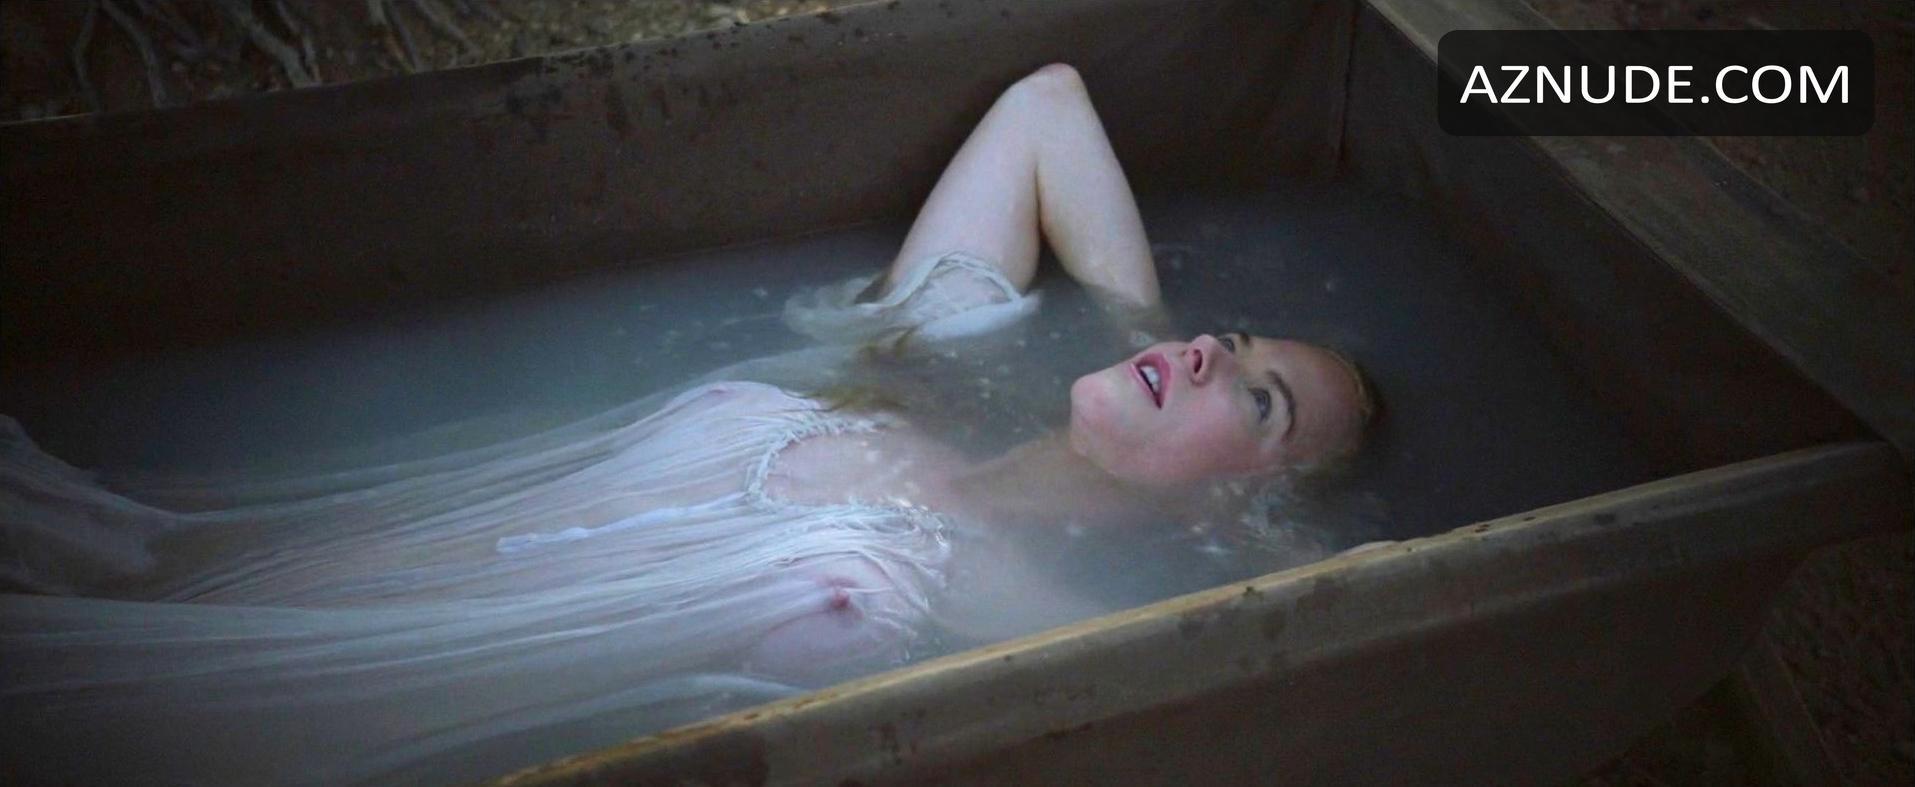 Nicole kidman nude photos